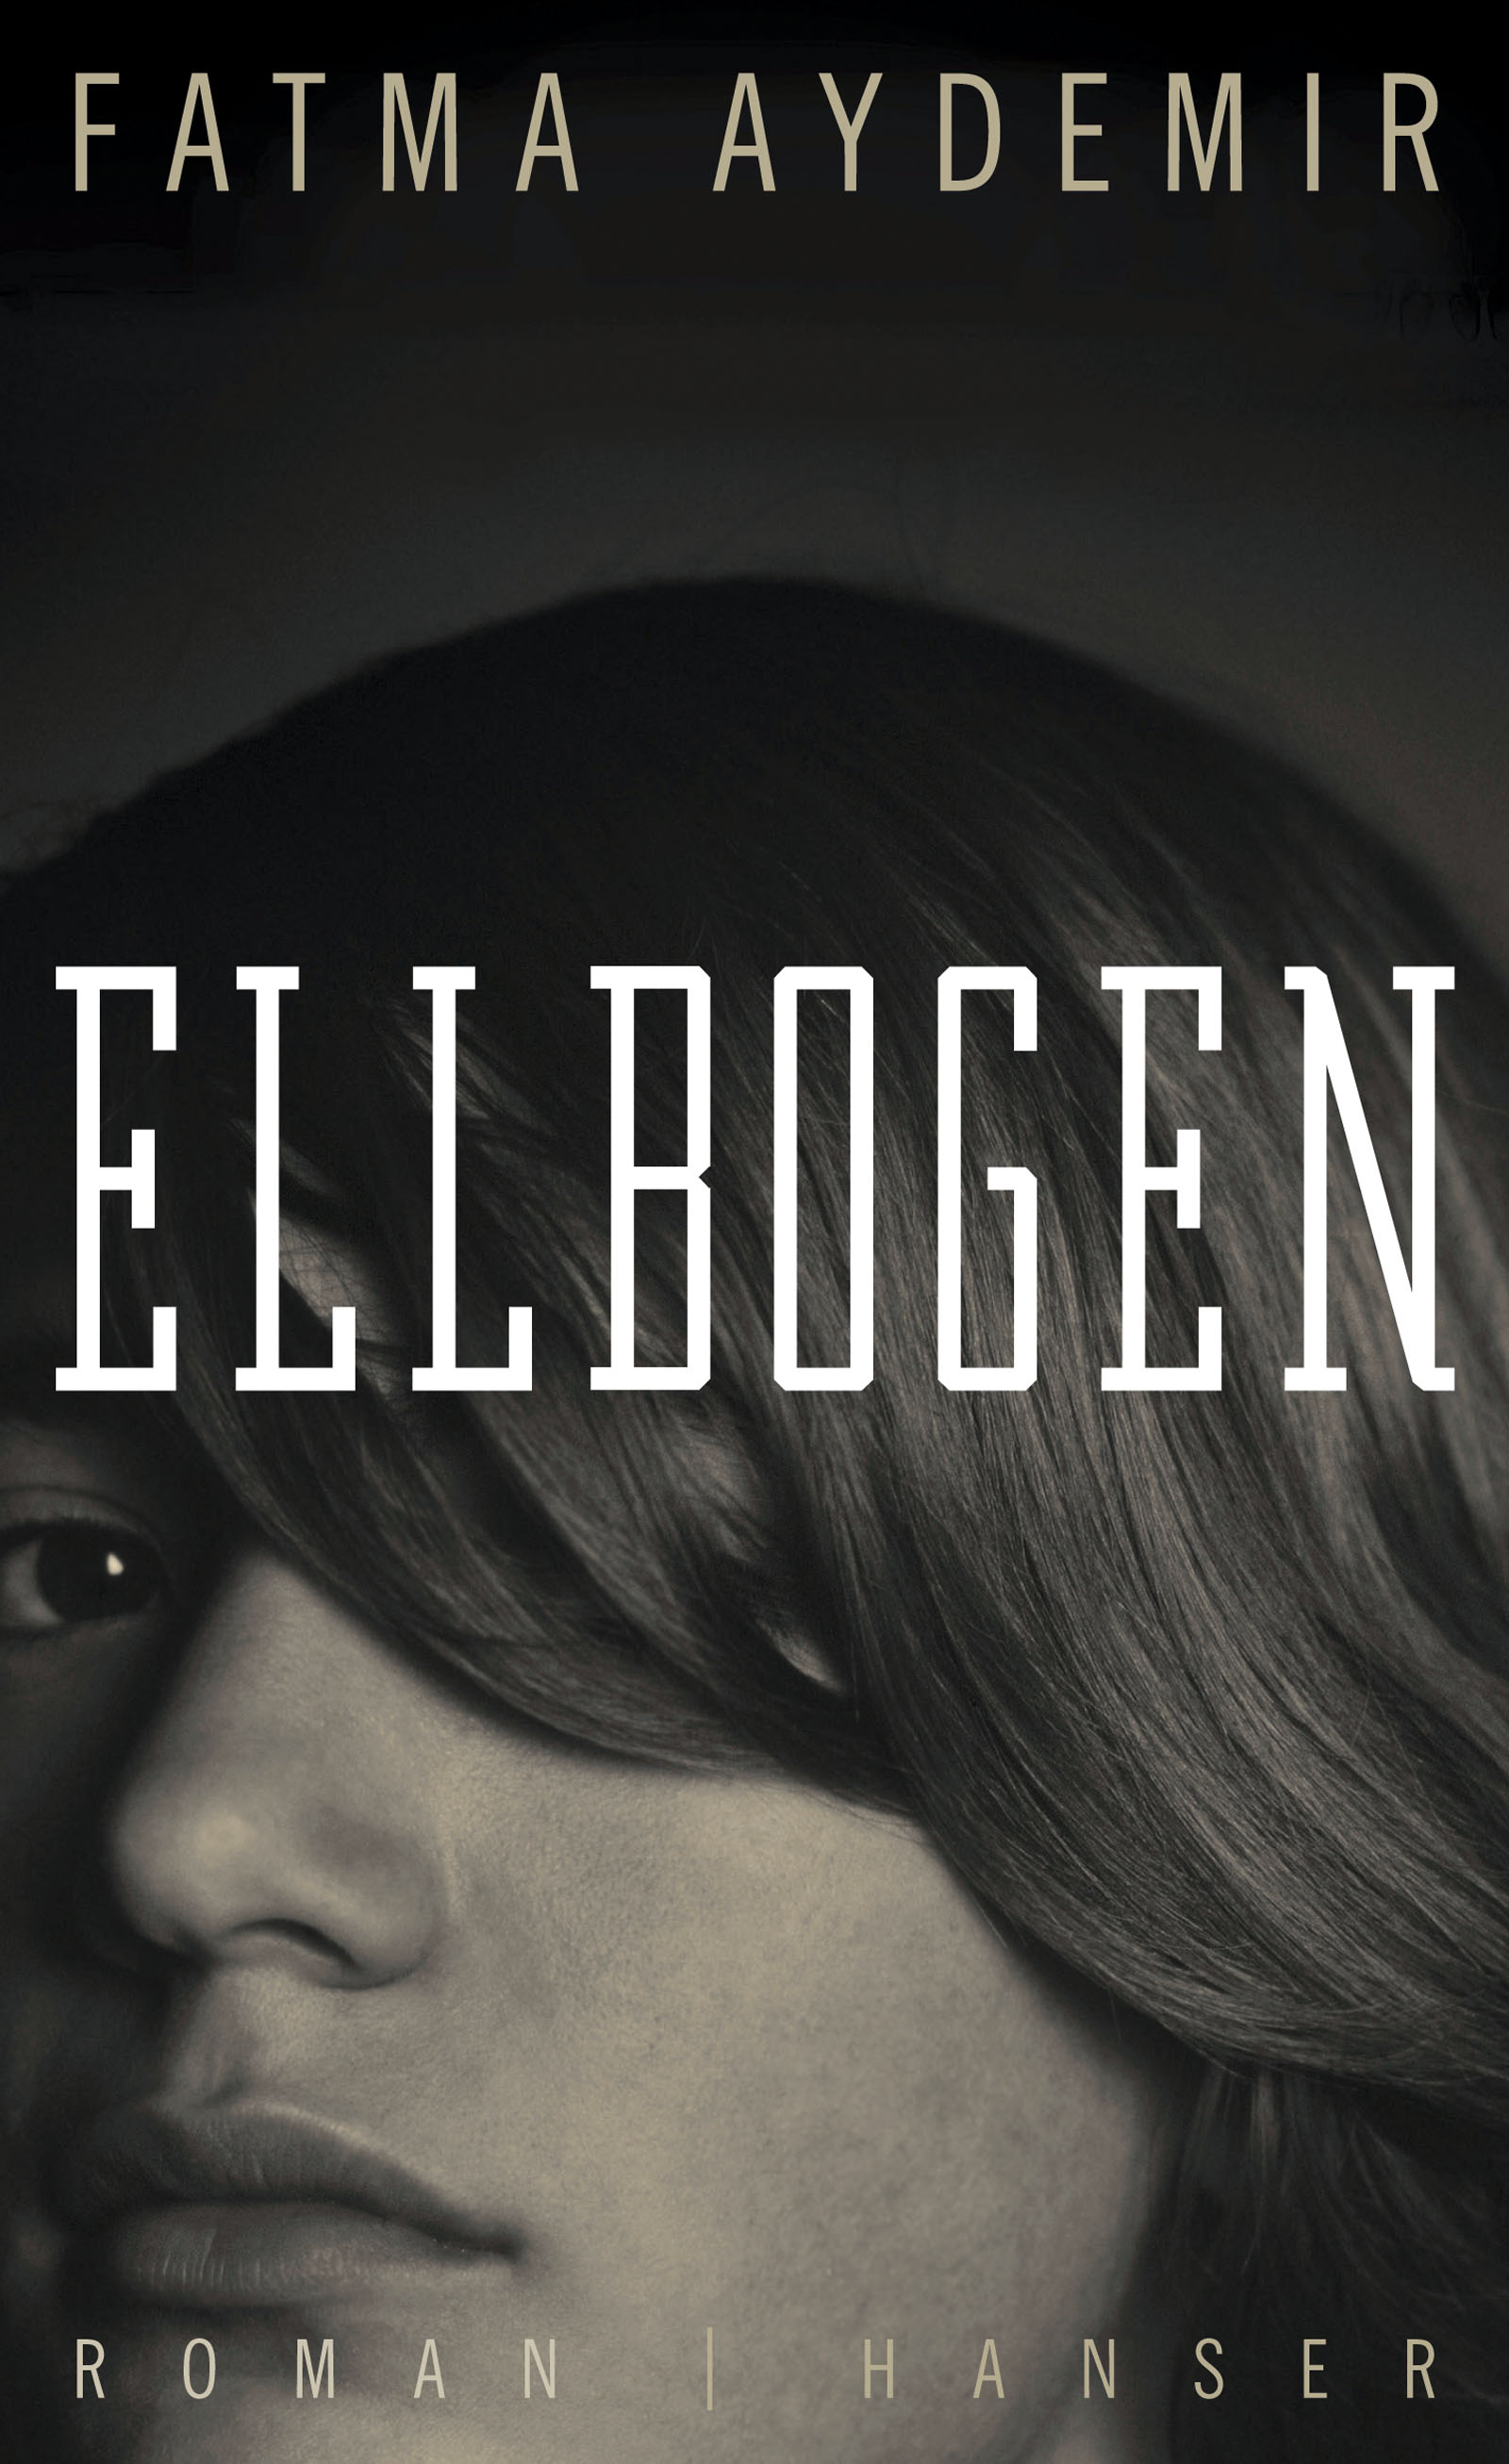 Ellbogen, Fatma Aydemir, Hanser Literaturverlage